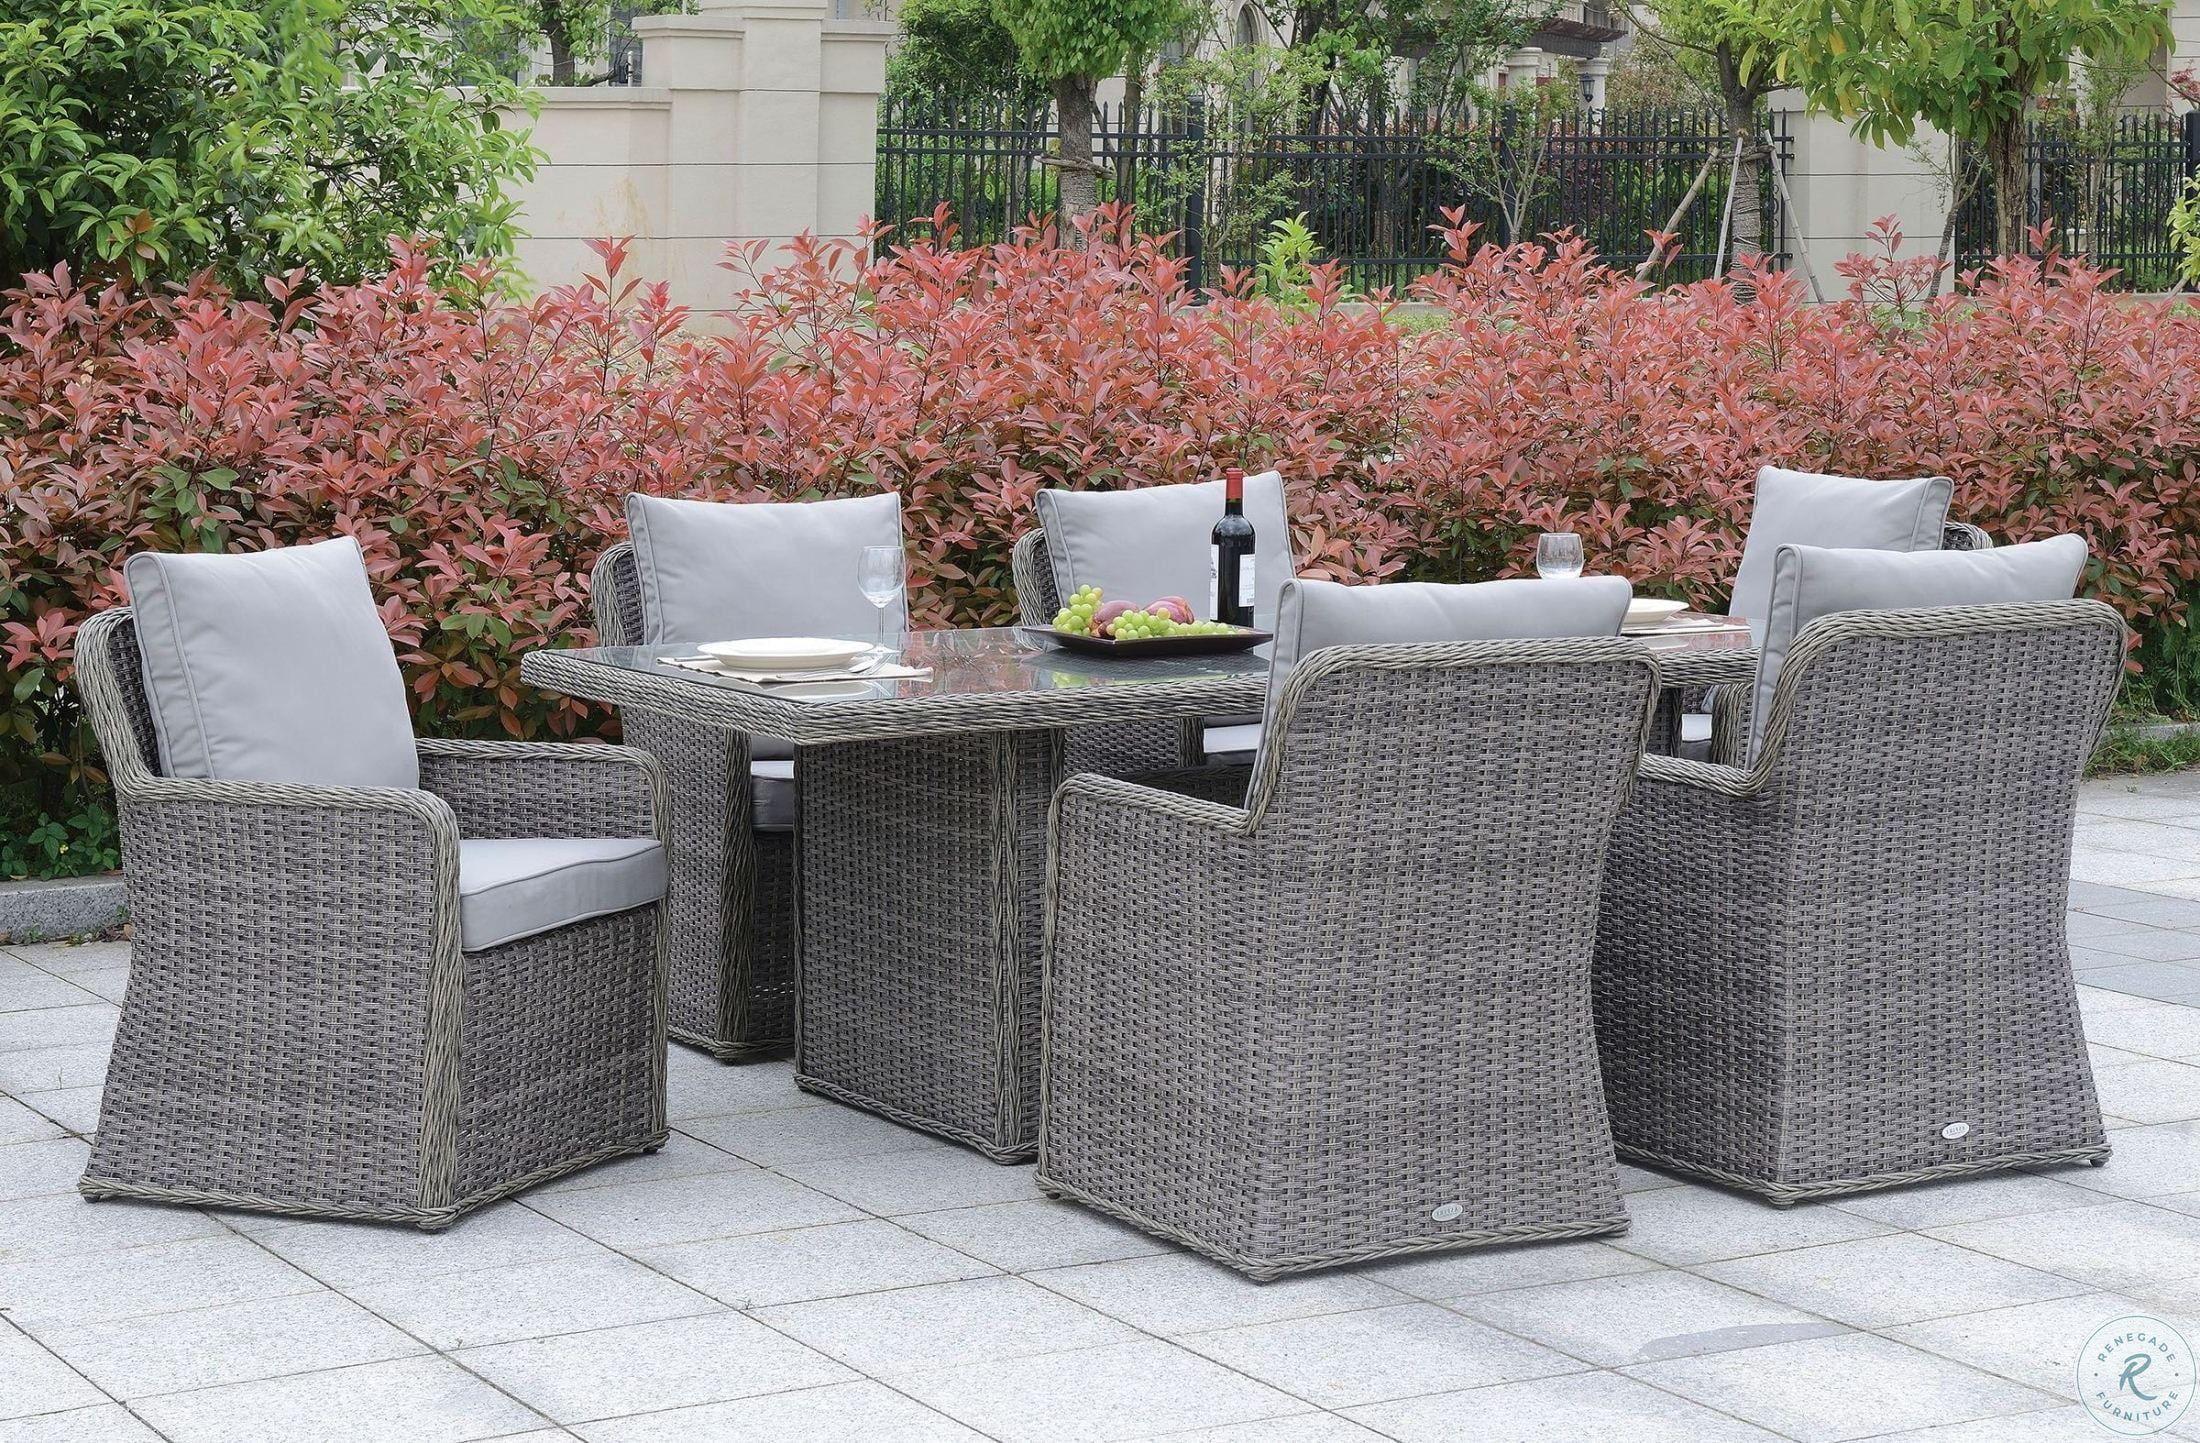 Beachcroft Beige Rectangular Outdoor Dining Set in 2020 ... on Beachcroft Beige Outdoor Living Room Set id=98102